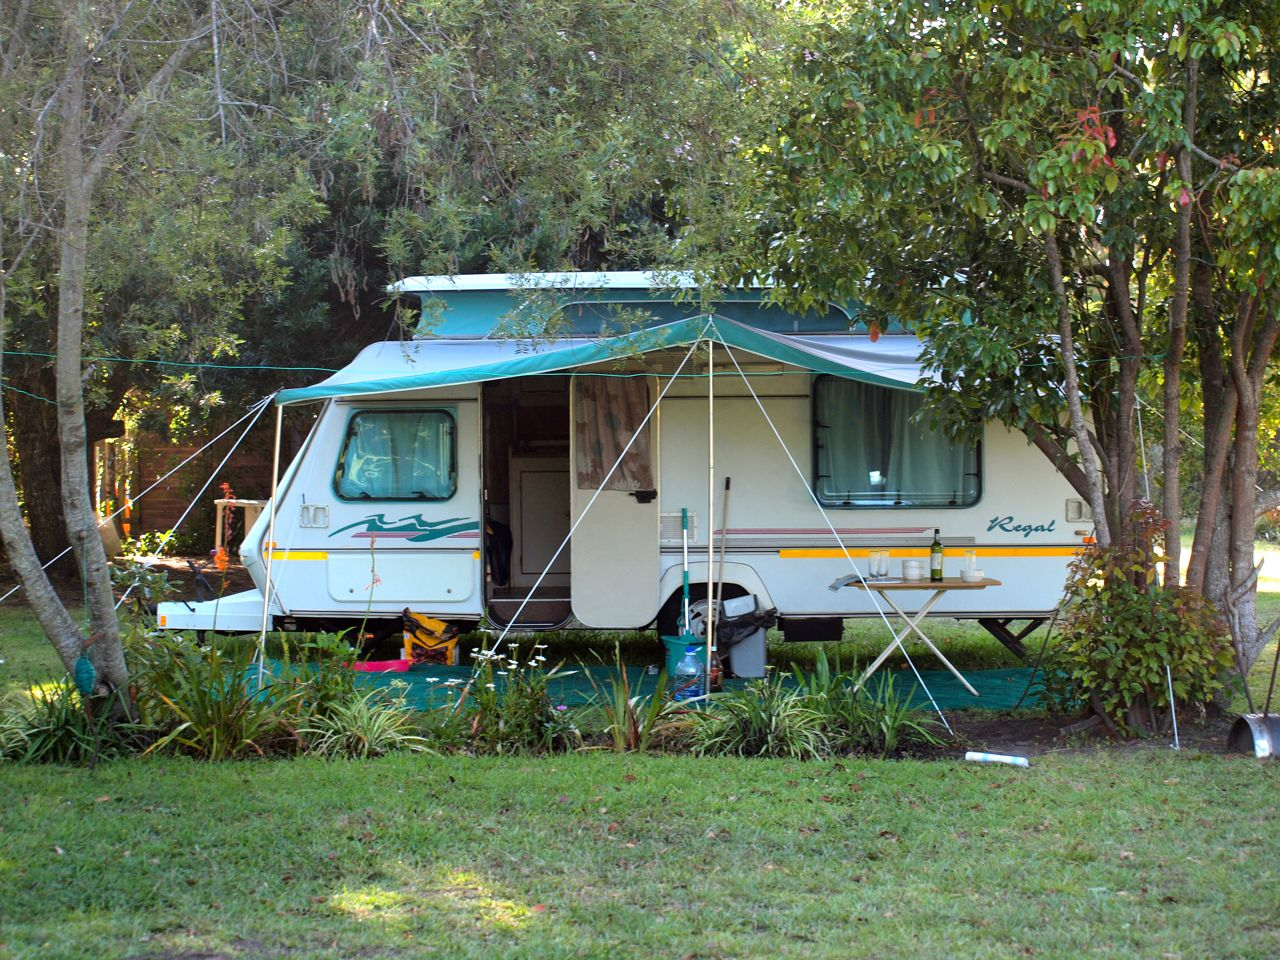 Campingplatz in Plettenberg Bay